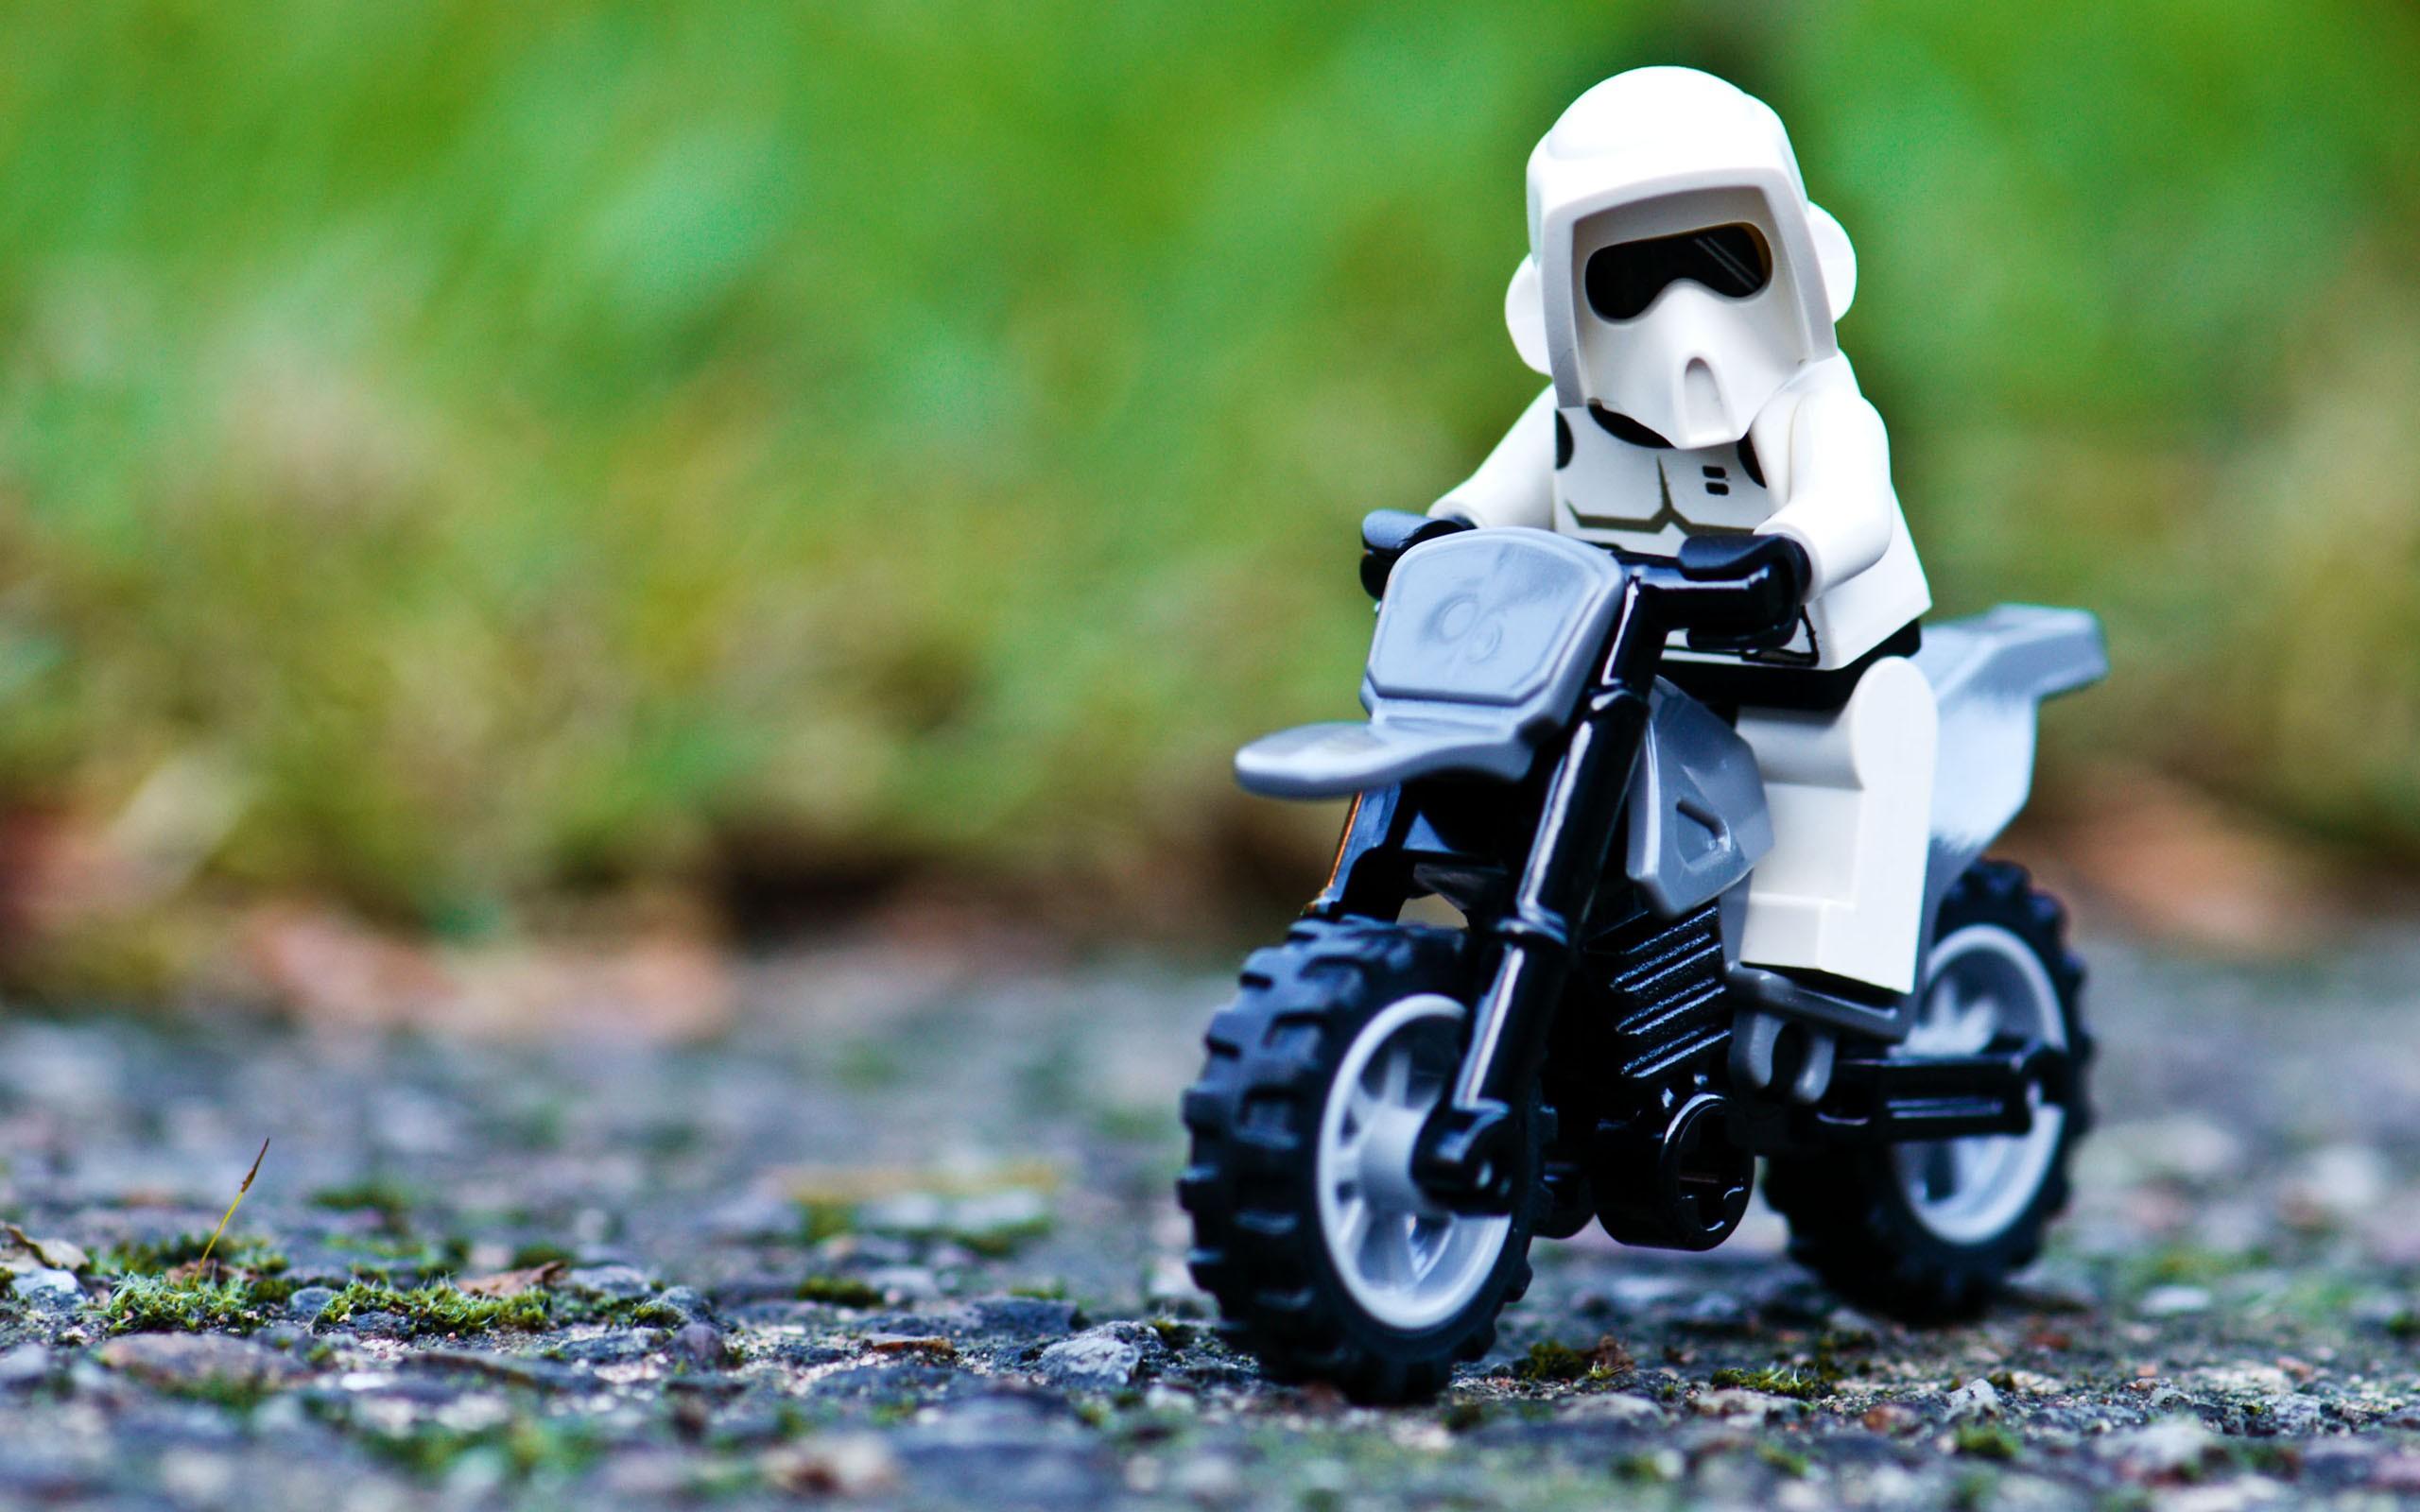 Funny Lego Star Wars Wallpaper 2560x1600 2498 Wallpaperup